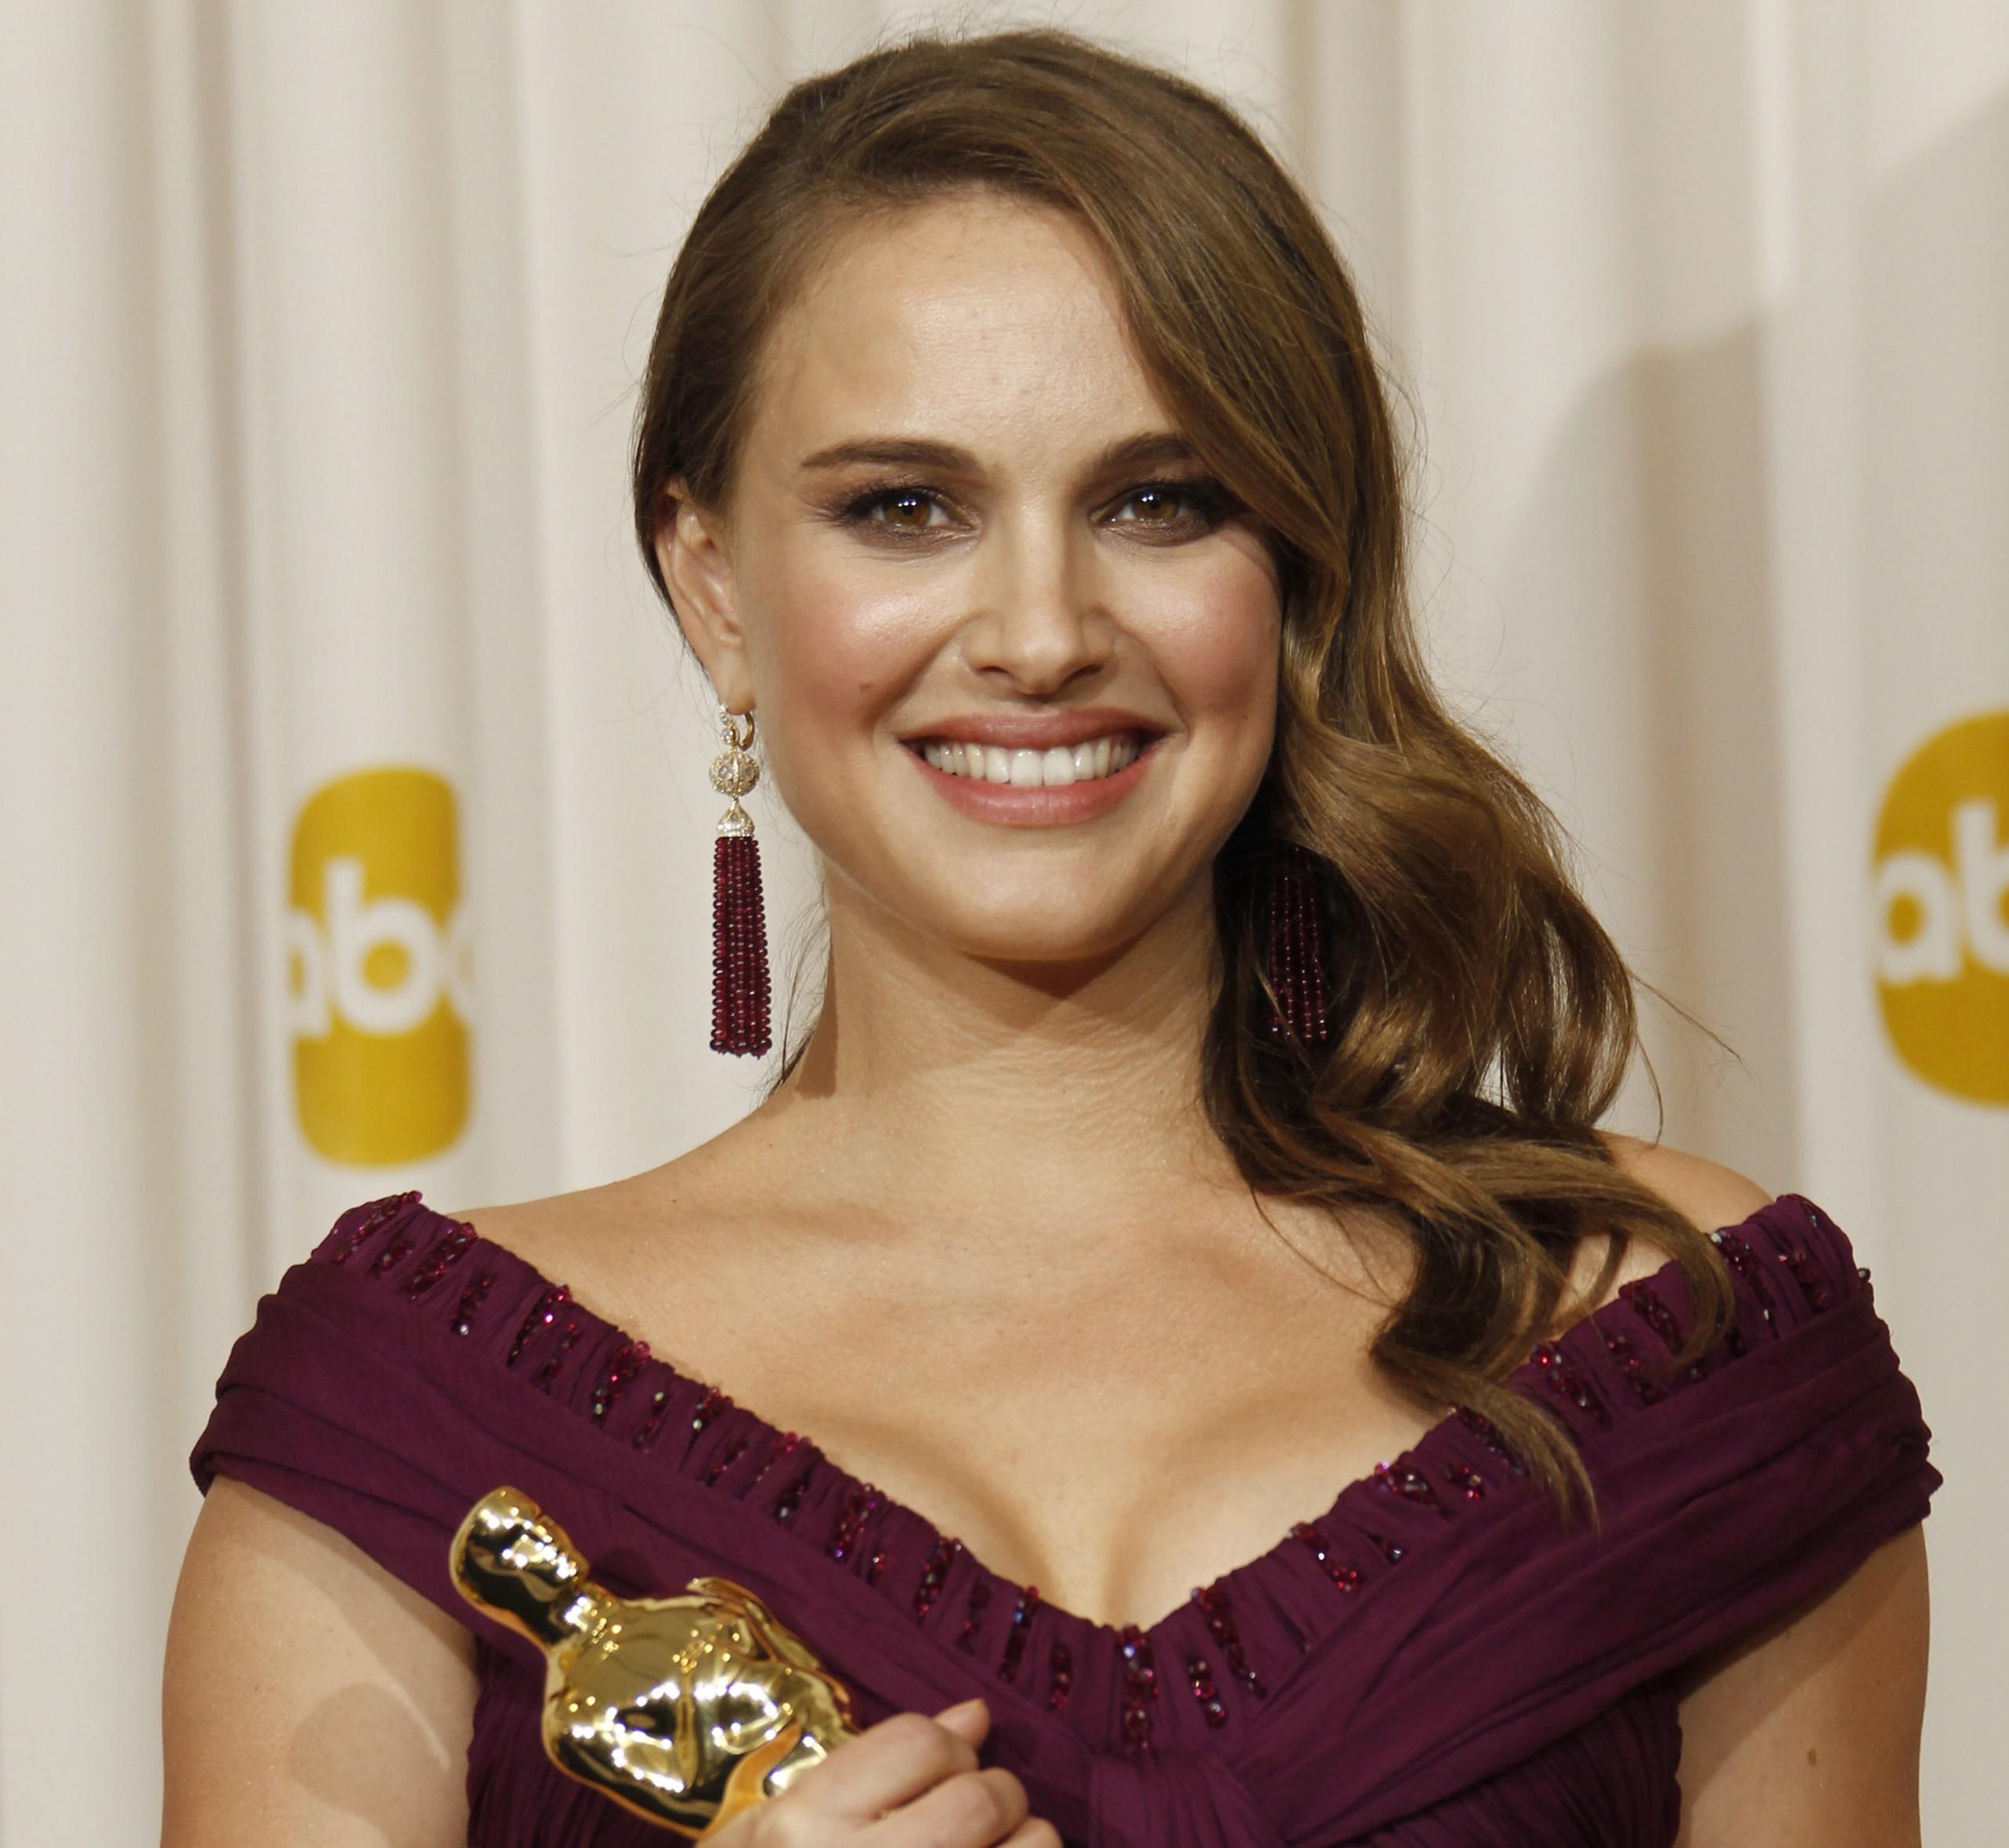 Natalie Portman tops Forbes list of 'best value' actors